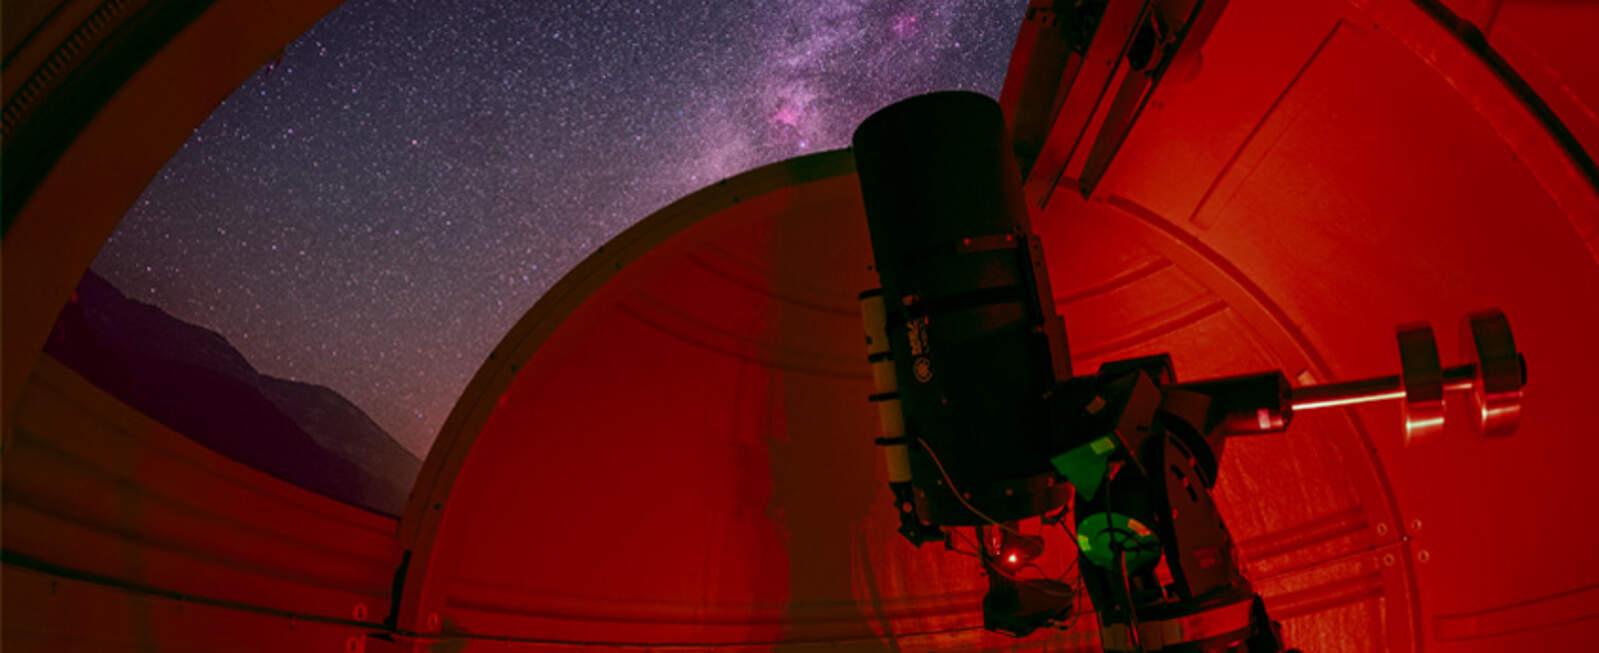 L'Observatori Astronòmic d'Albanyà